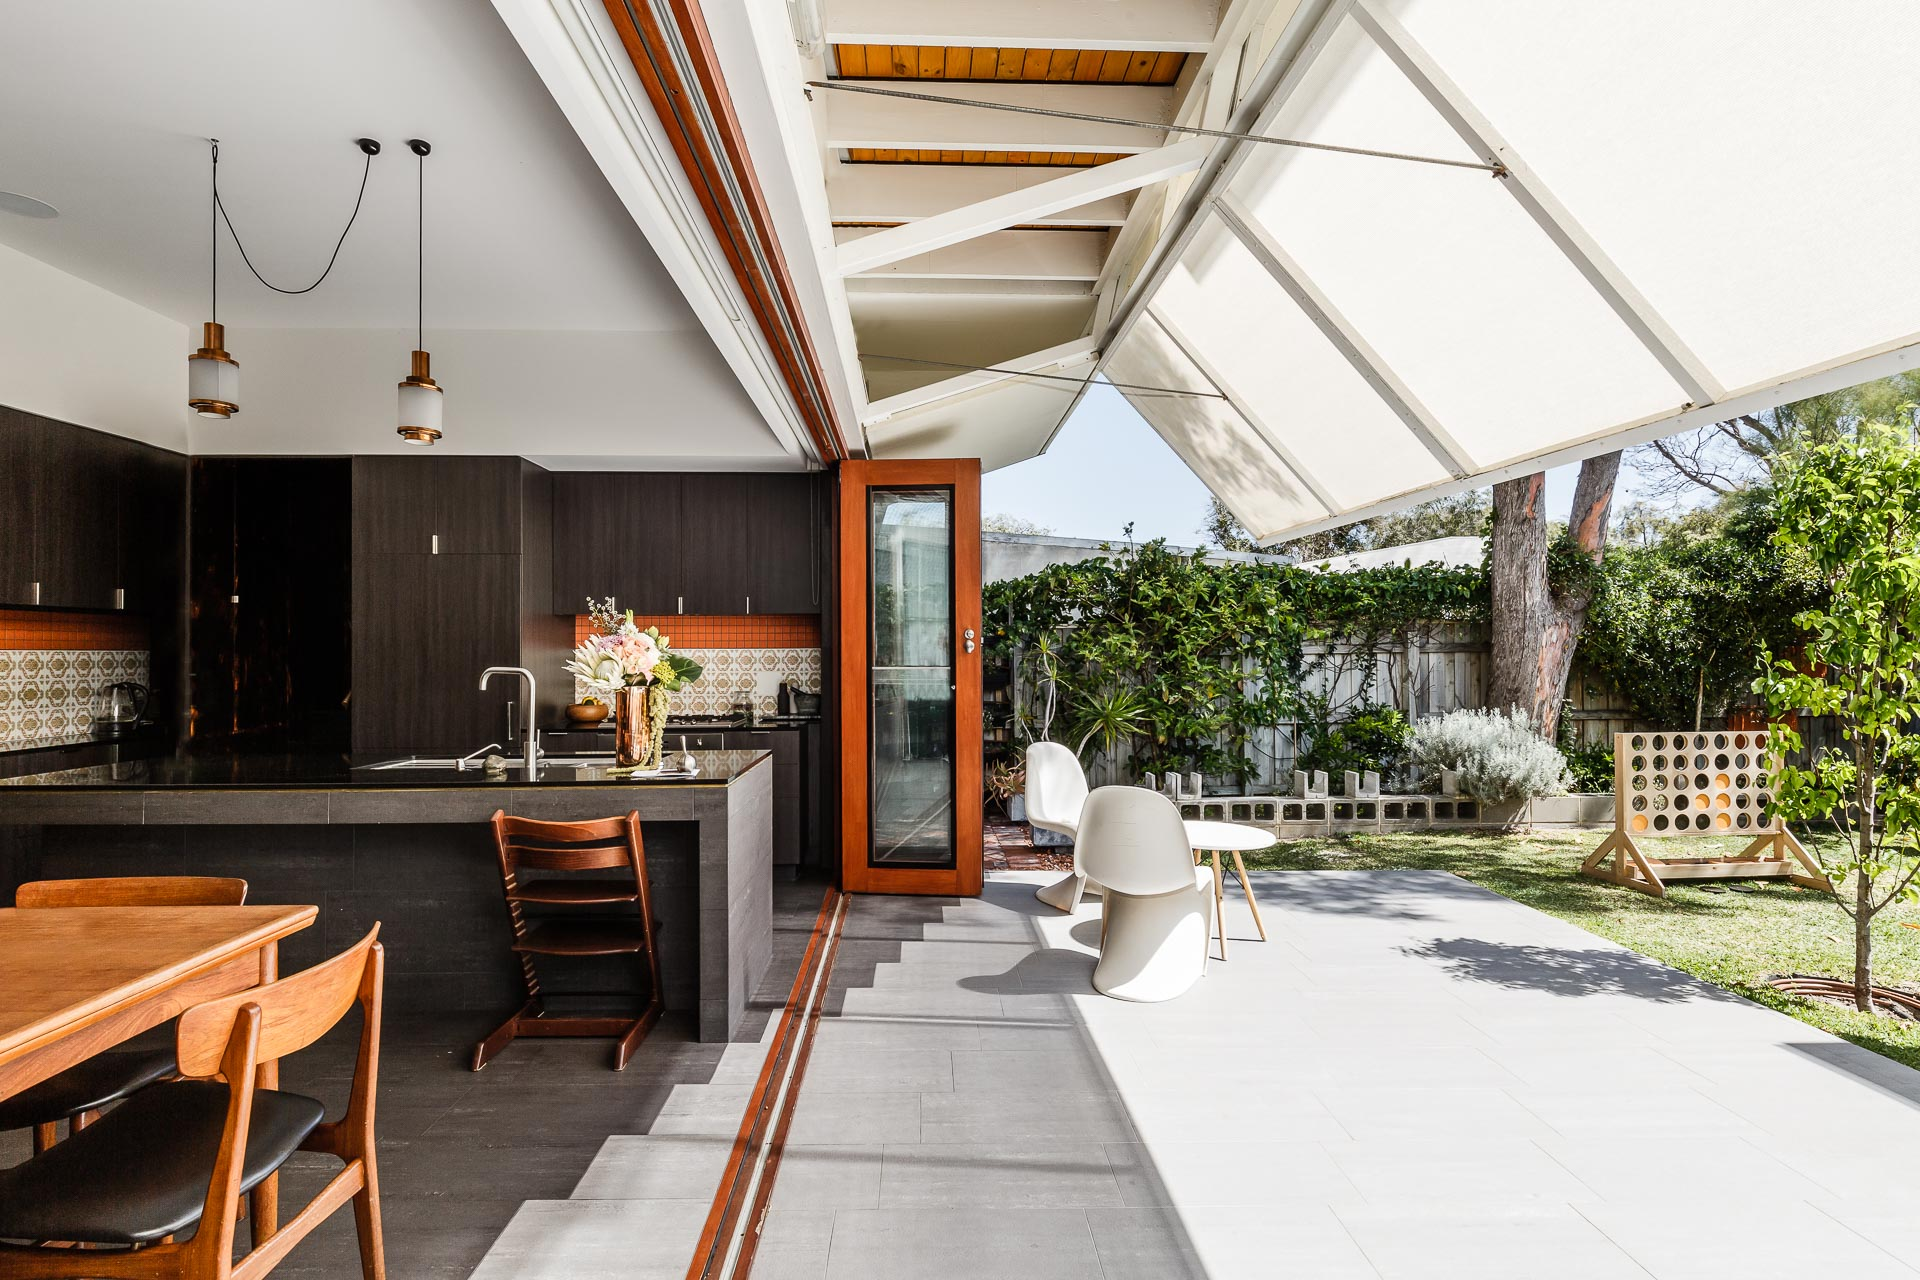 WEB - Architectural Photography Sydney - Open House Perth 2016  - Sebastian Photography 24.jpg